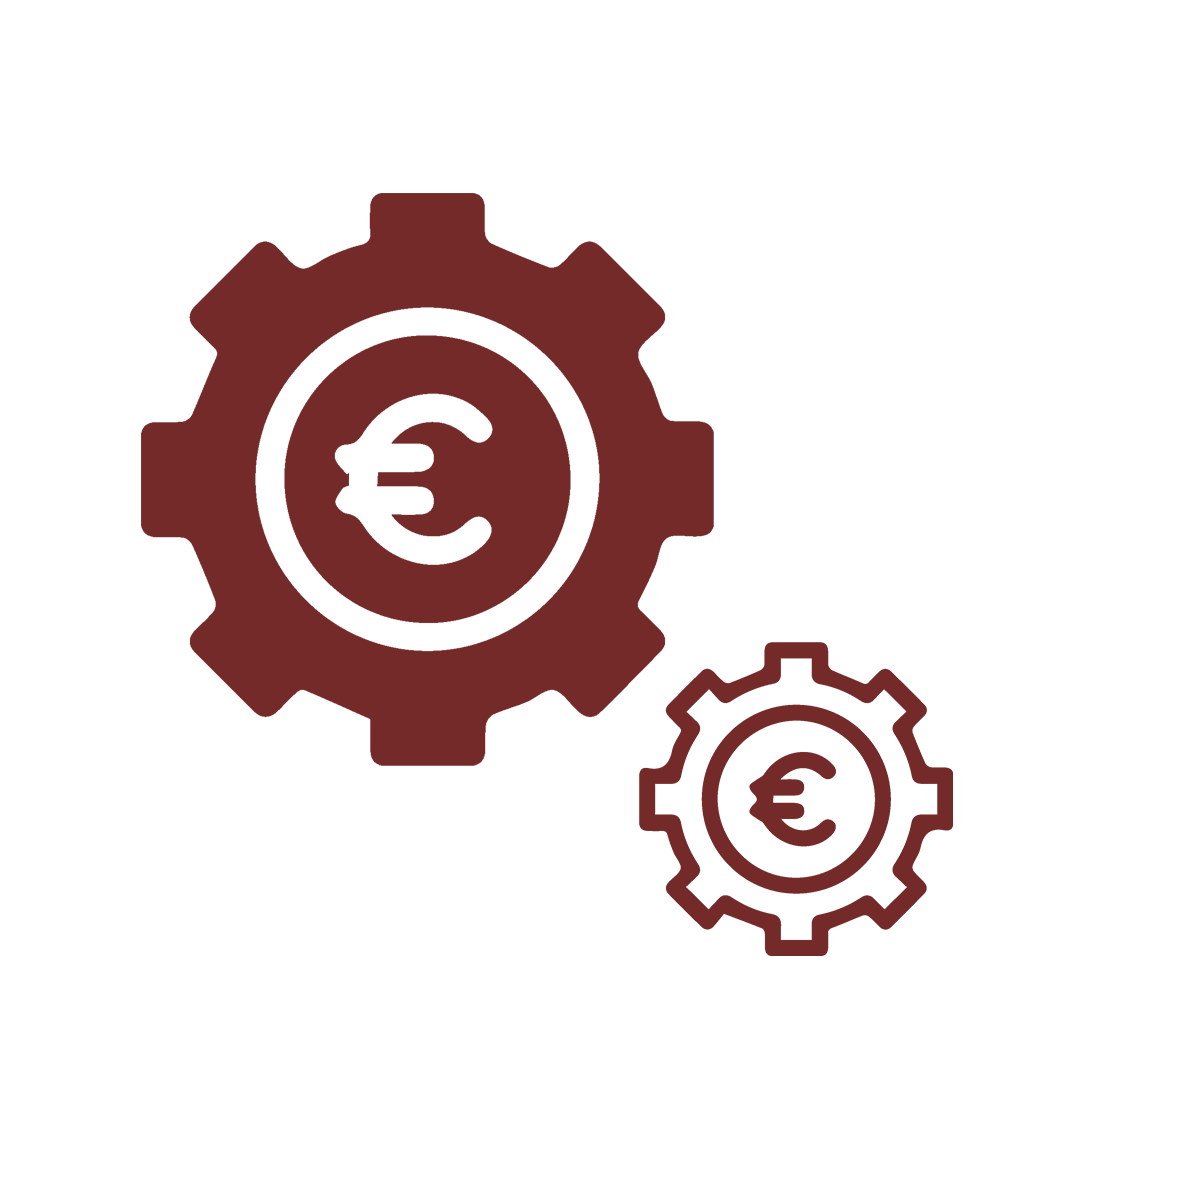 PIRM: Programa Intensivo Revenue Management